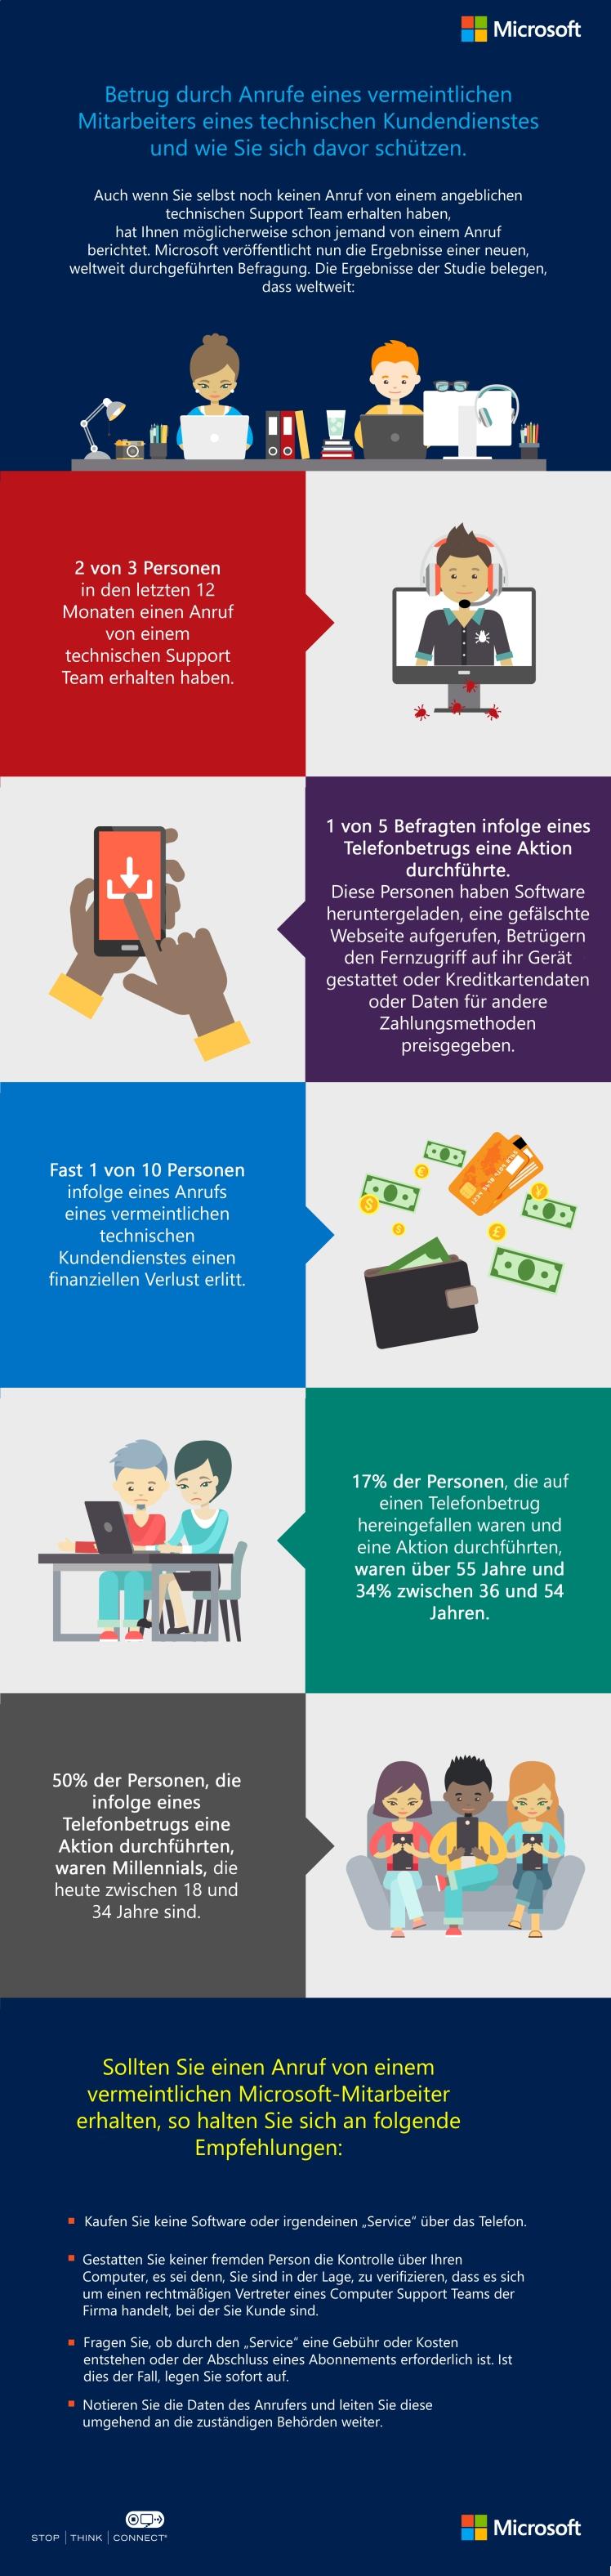 Microsoft Betrugsfälle Infografik.jpg